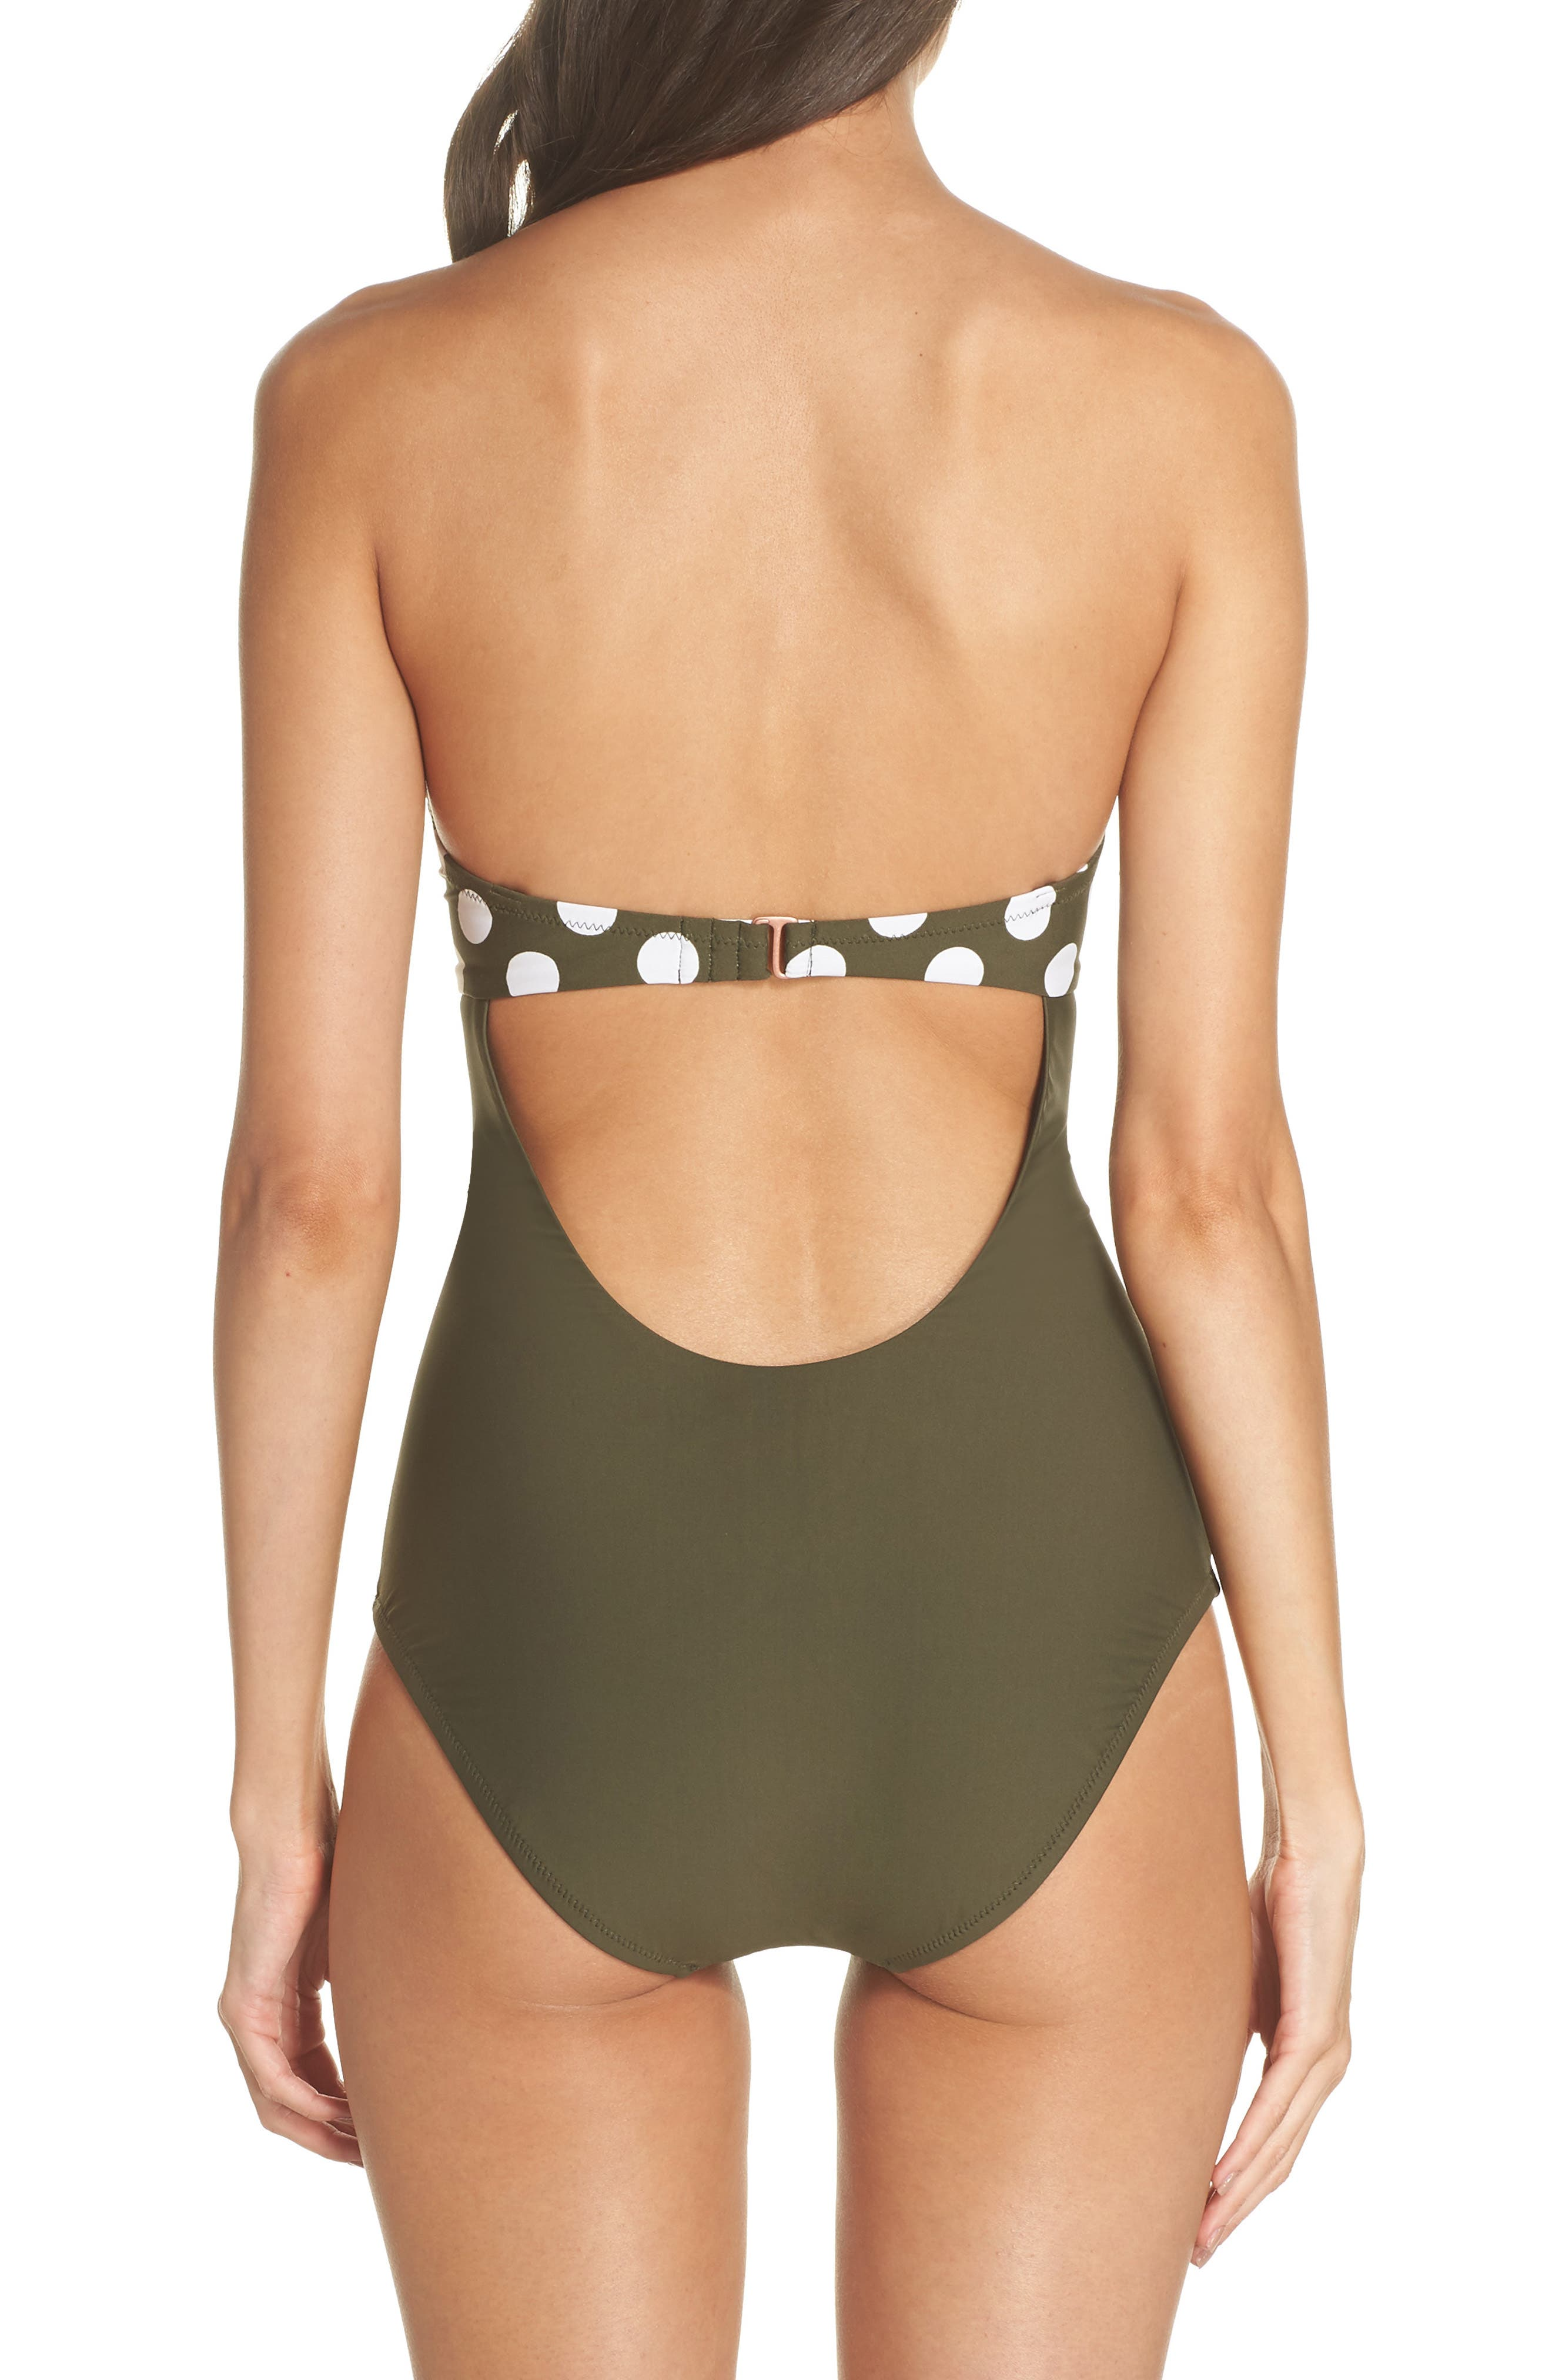 Scallop Bandeau One-Piece Swimsuit,                             Alternate thumbnail 3, color,                             OLIVE SARMA/ IVORY EGRET DOT